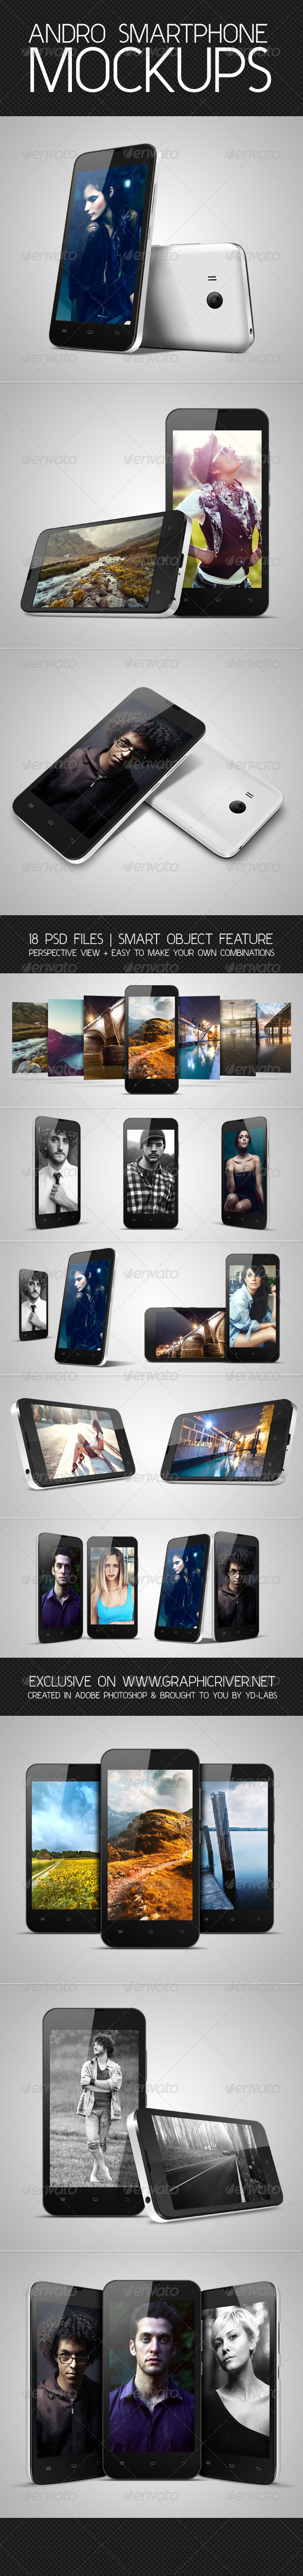 GraphicRiver Andro Smartphone Mockups 4631442